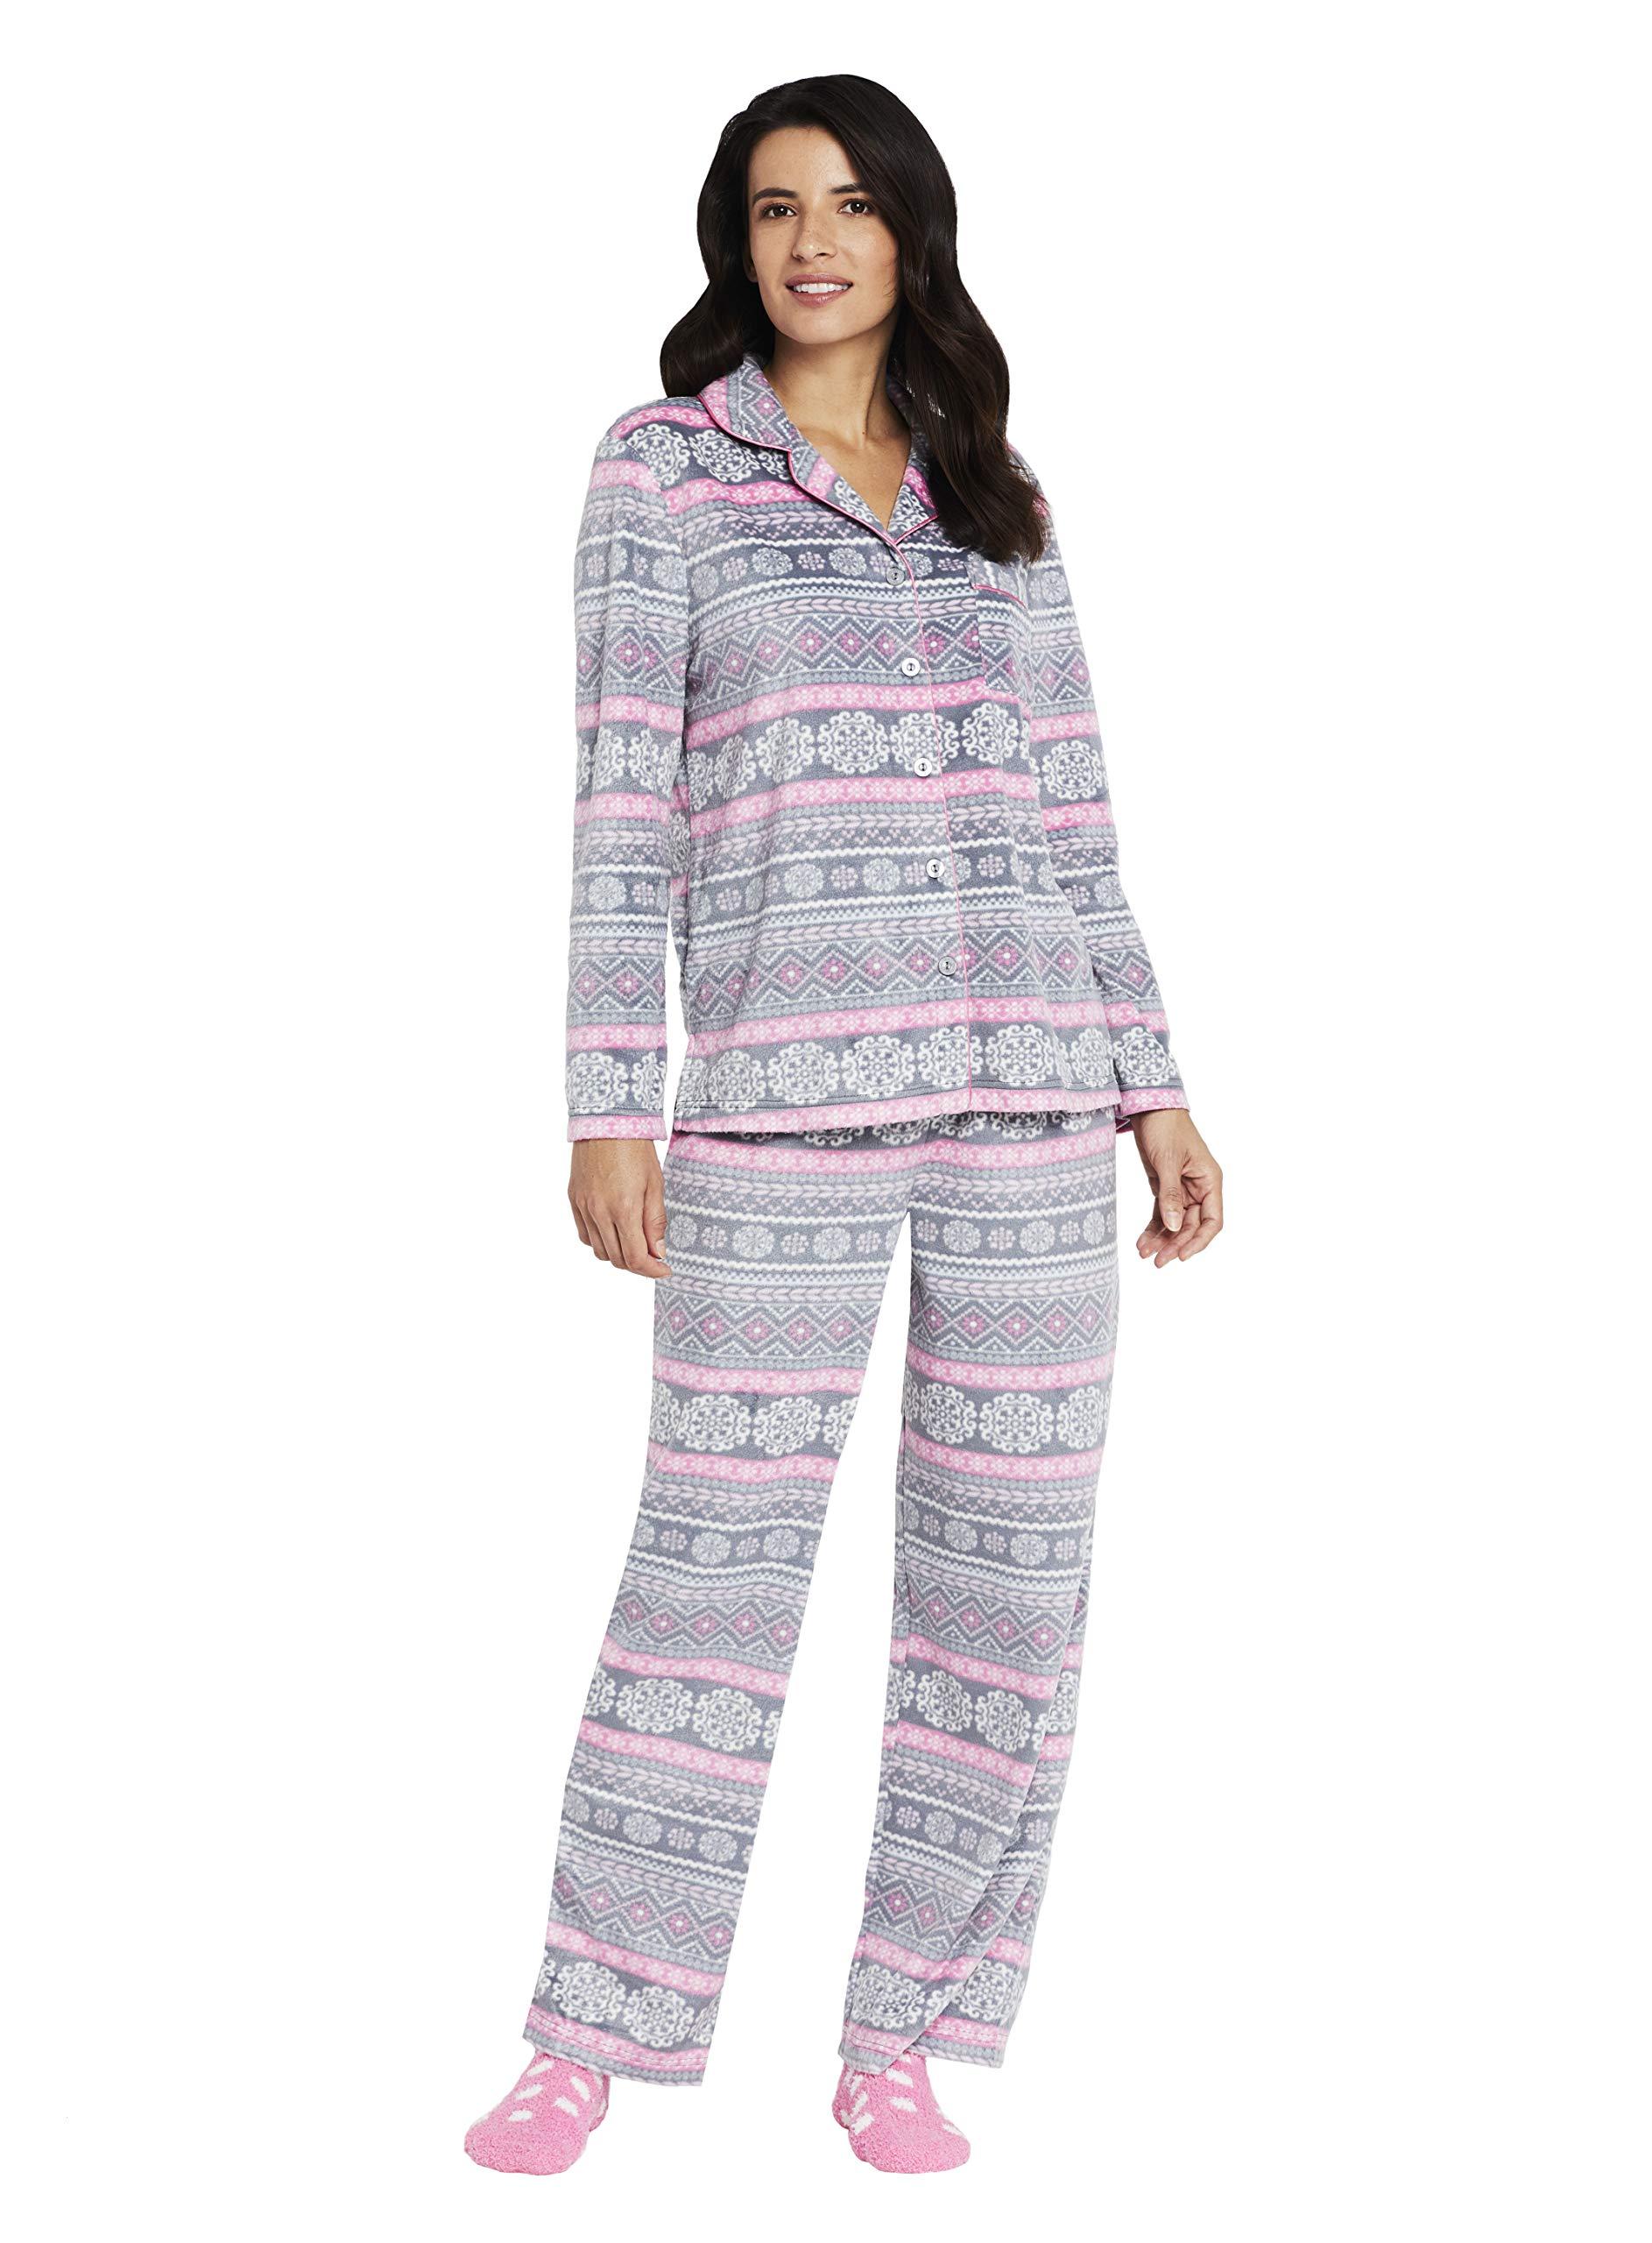 Karen Neuburger Women's Petite Long Sleeve Minky Fleece Pajama Set PJ, Medallion Fairisle Charcoal Grey/Pink/White, P/M by Karen Neuburger